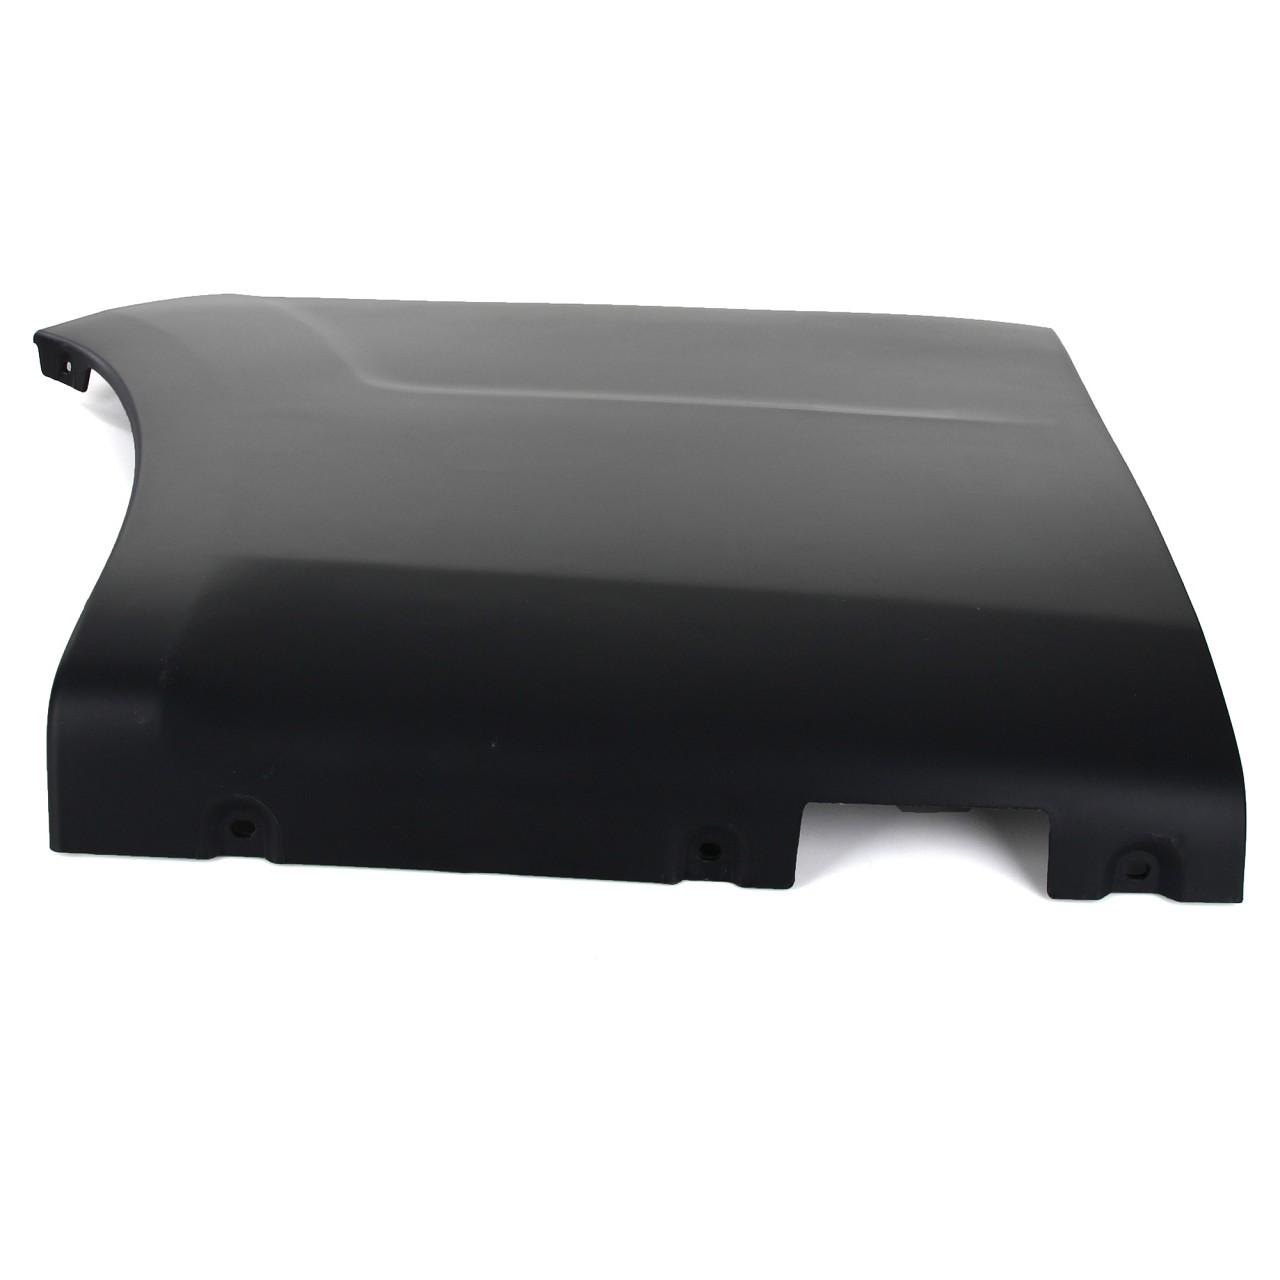 ORIGINAL Fiat Rammschutzleiste HINTEN LINKS 735491686 für DUCATO (250_ 290_)